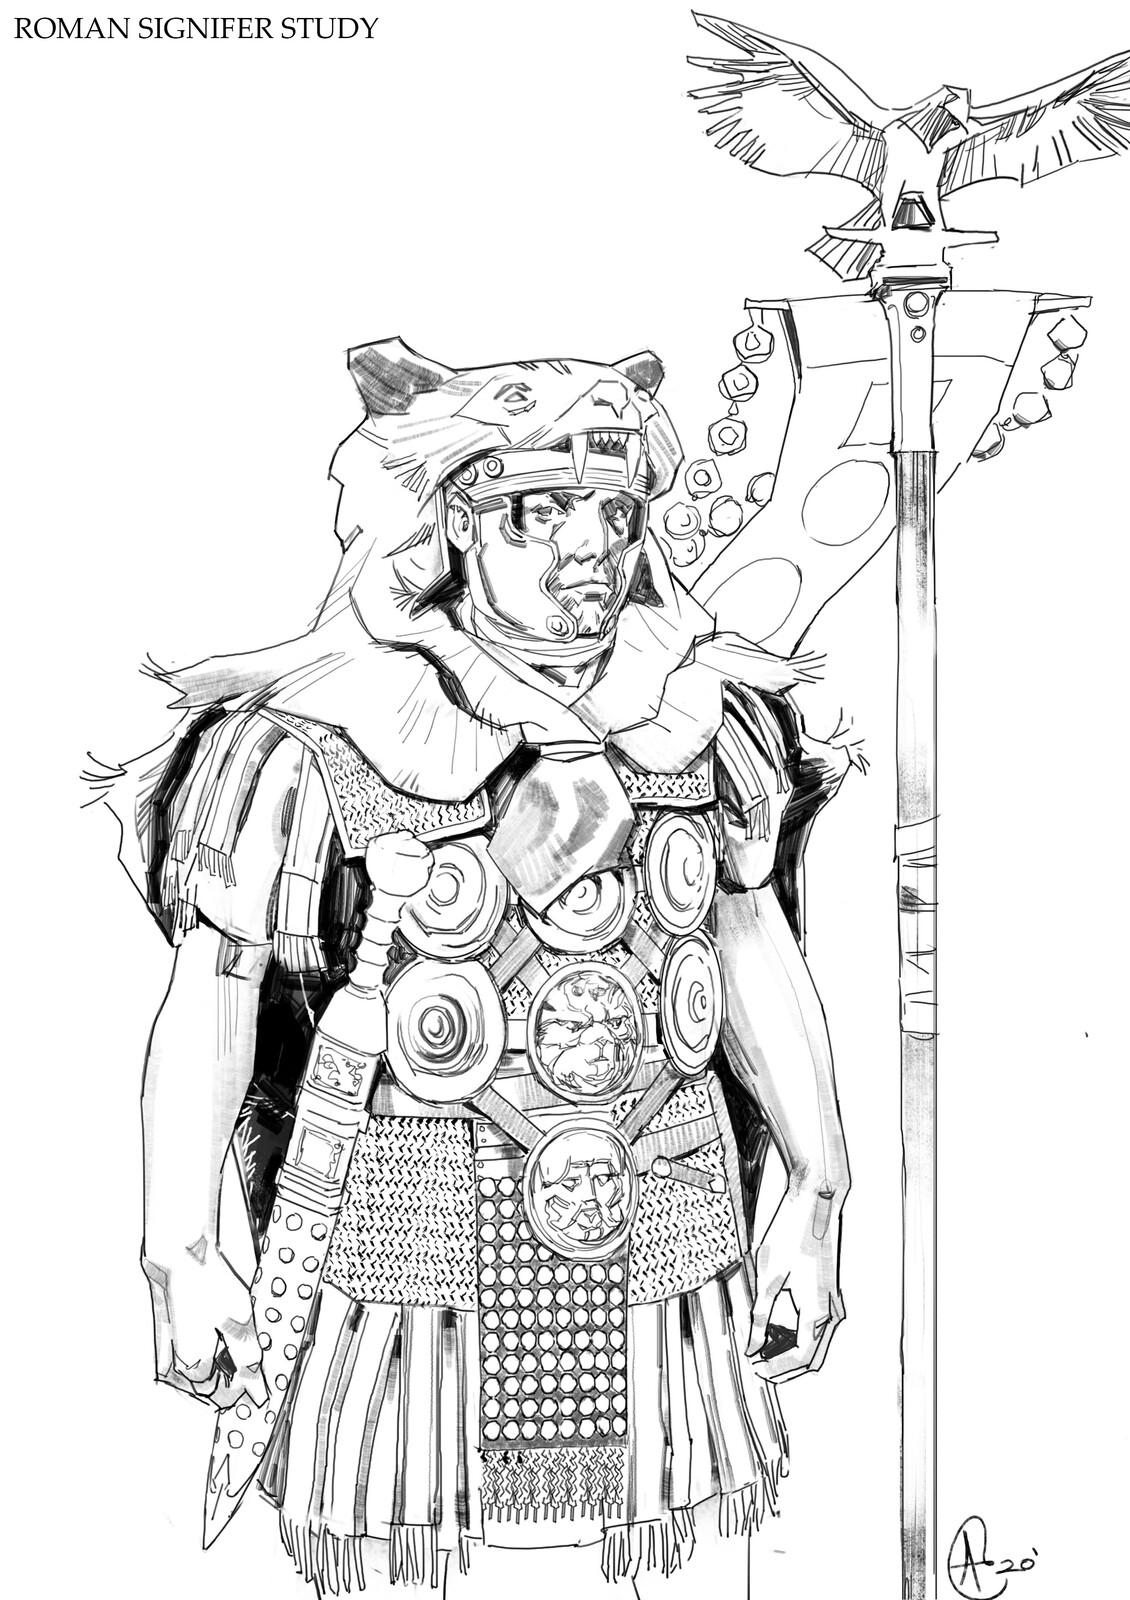 Roman Signifer Study